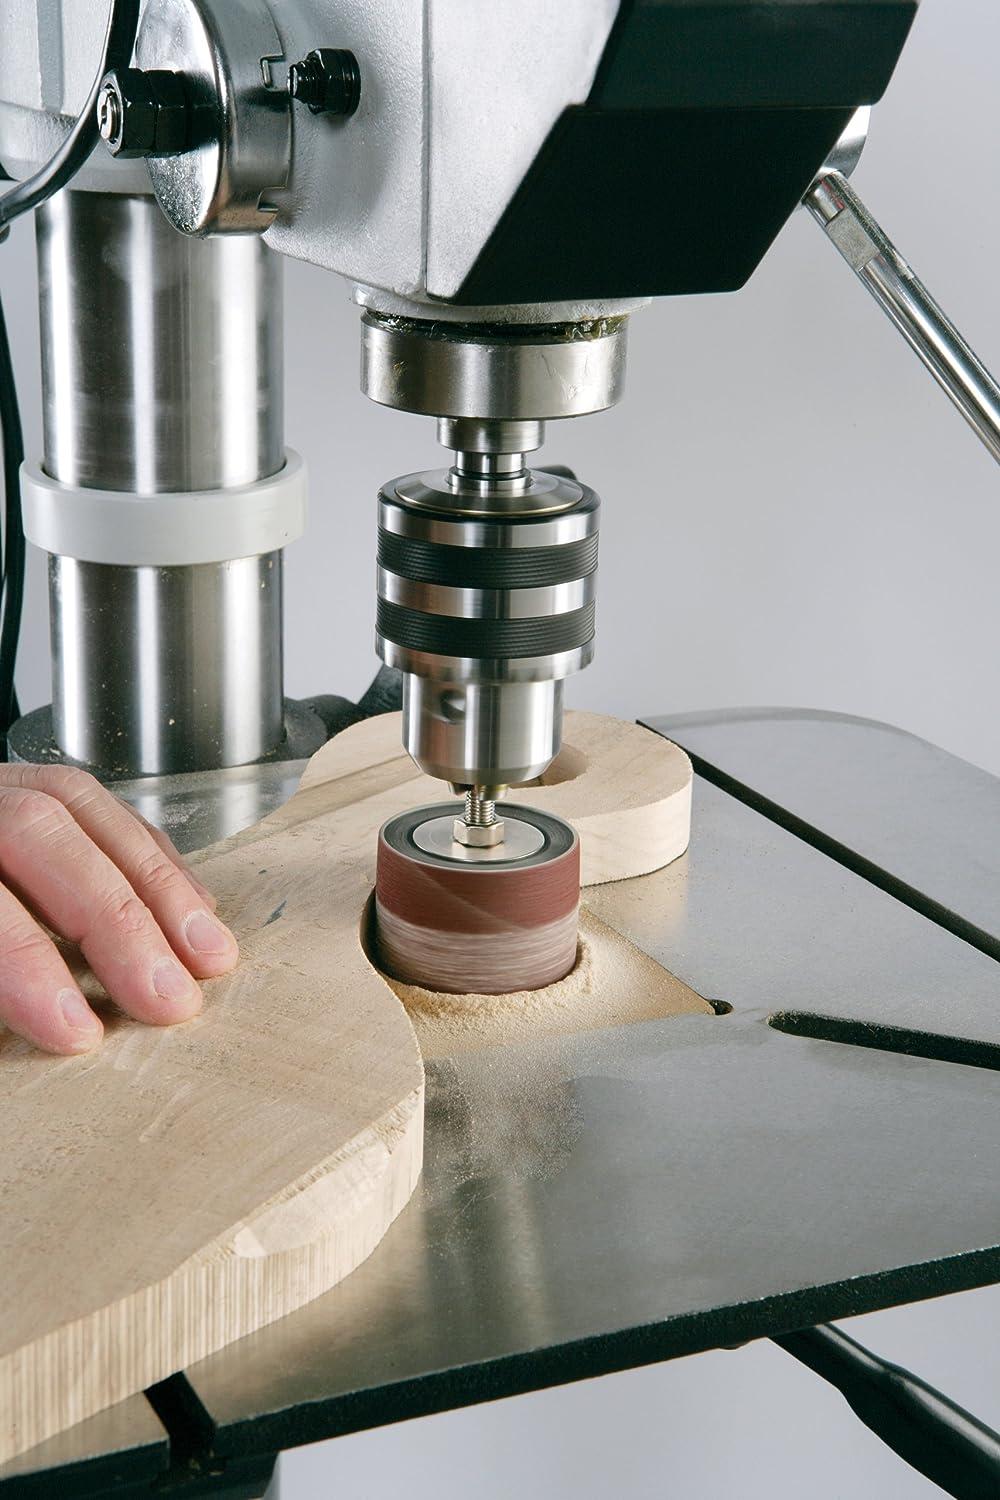 drum sander for drill. drum sander for drill